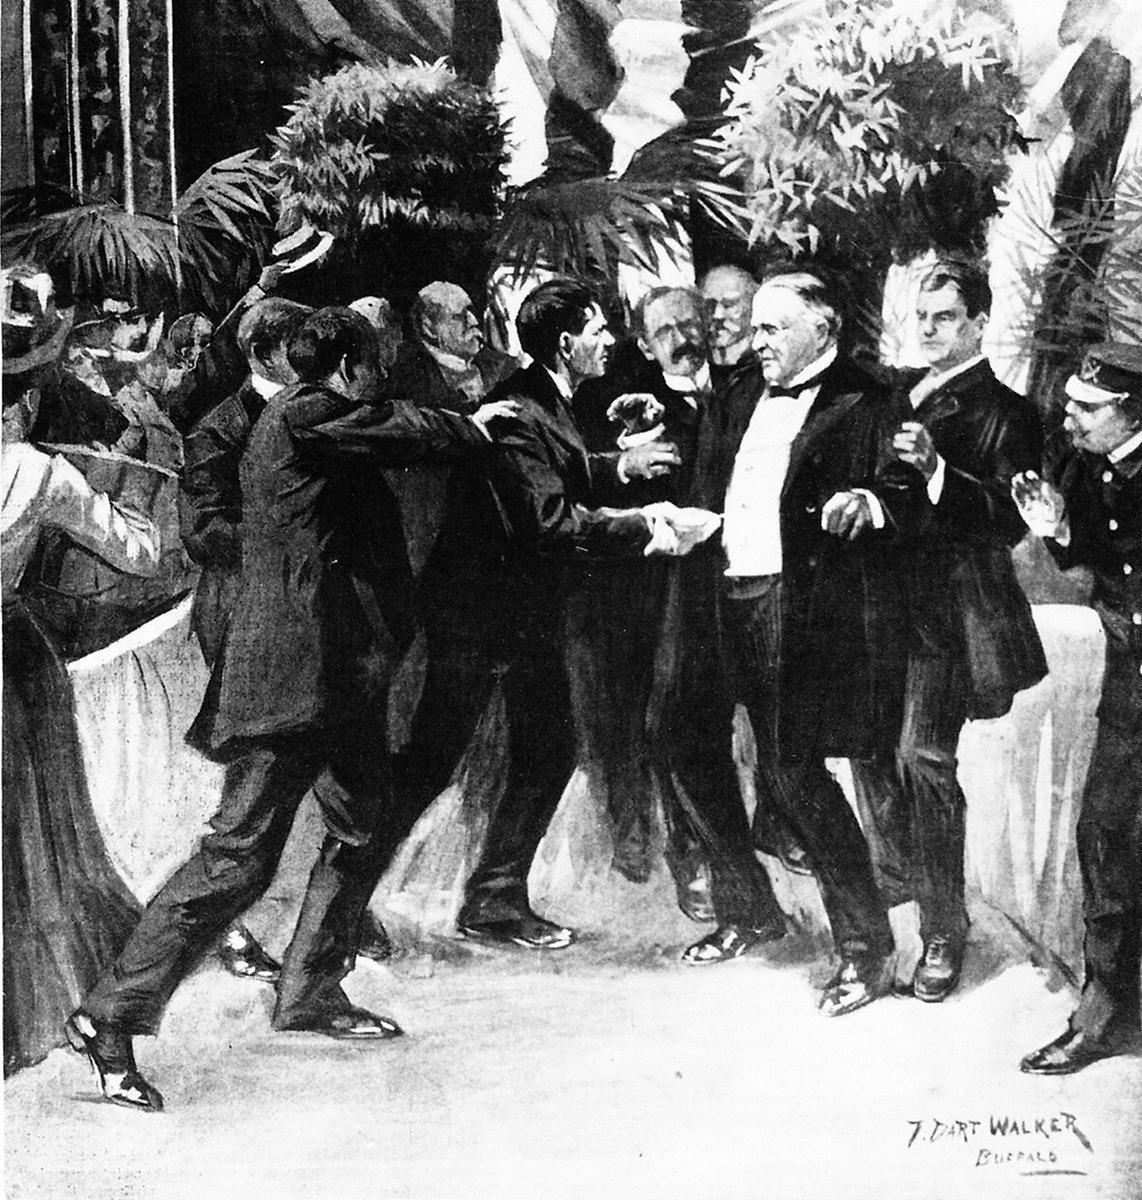 President McKinley - Assassination - A SHOOTING IN BUFFALO